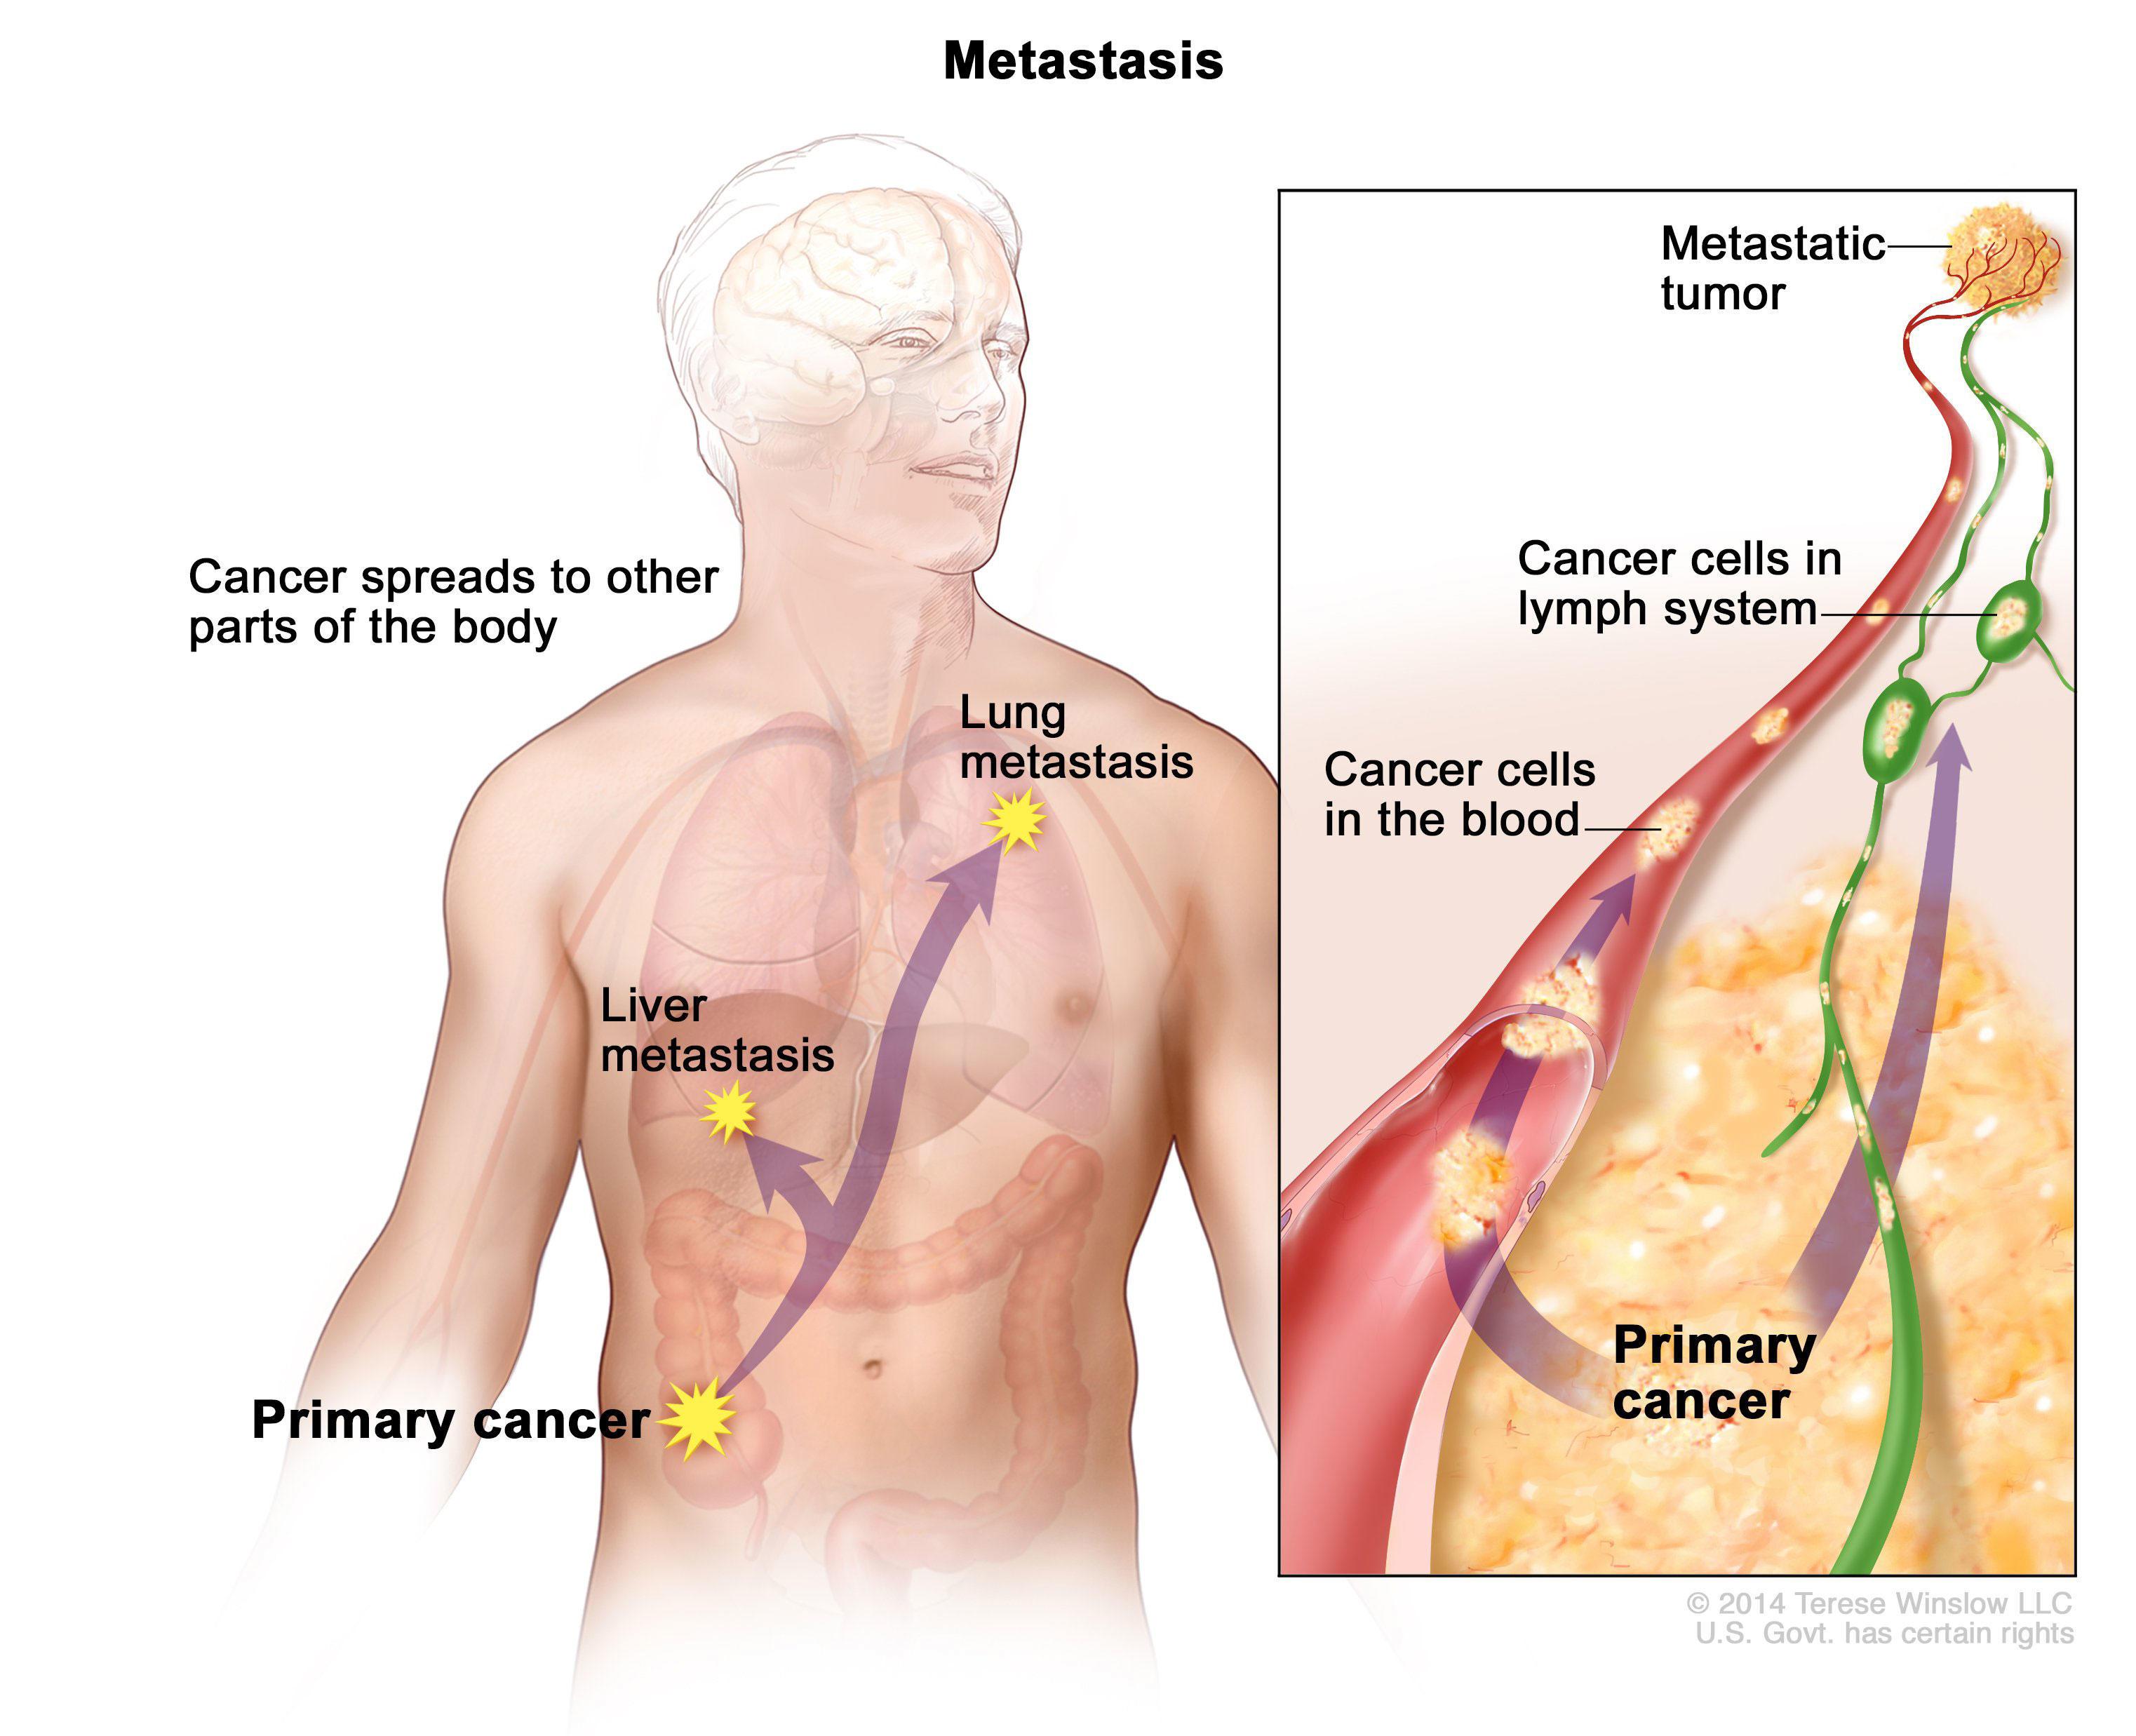 metastatic cancer of the colon symptoms